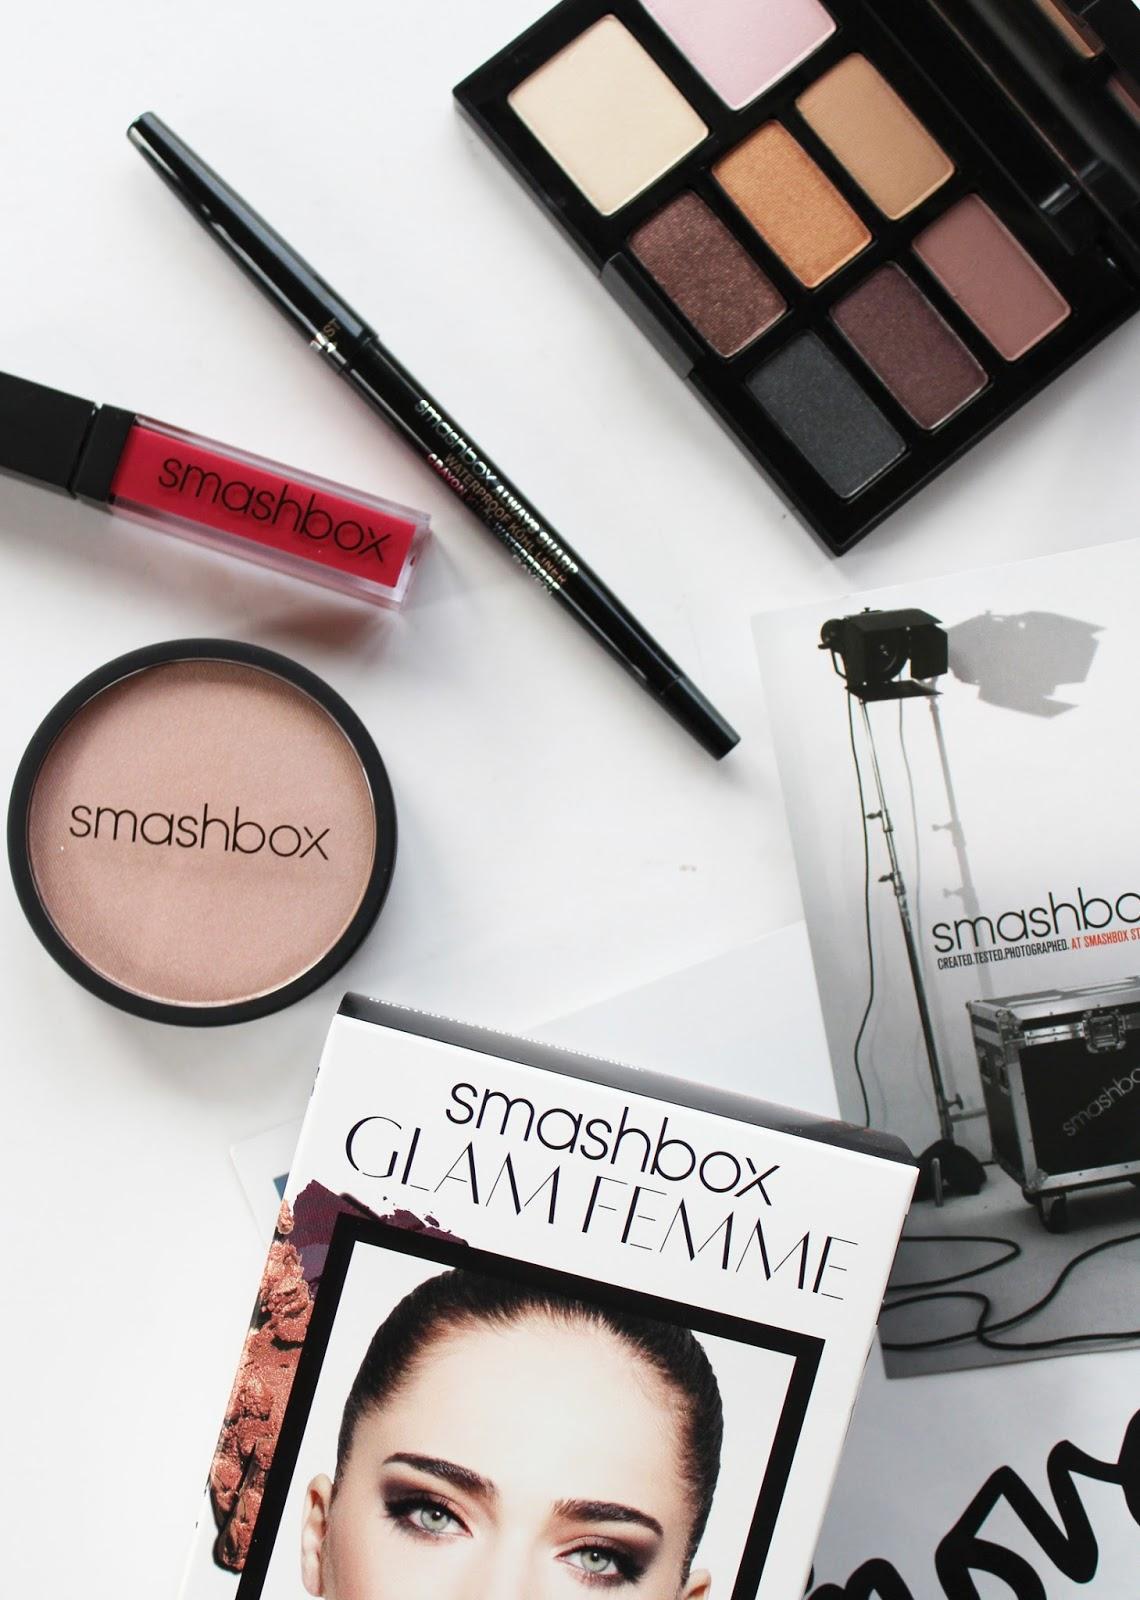 SMASHBOX   Glam Femme Makeup Set - Review + Swatches - CassandraMyee